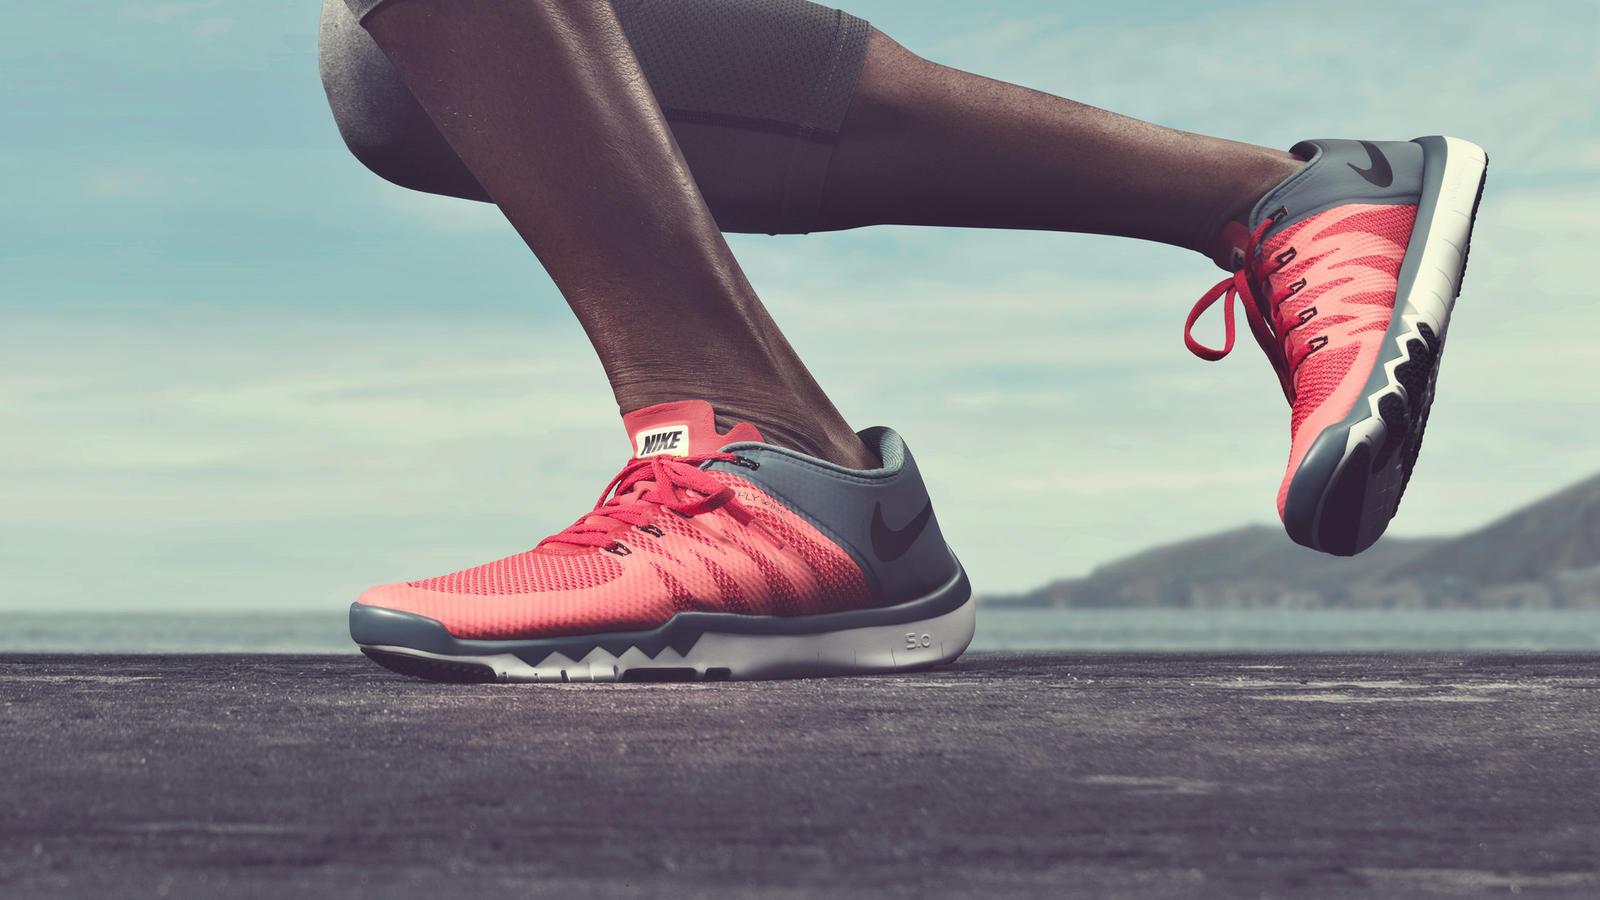 Download Nike 5.0 Free Trainers  JPG